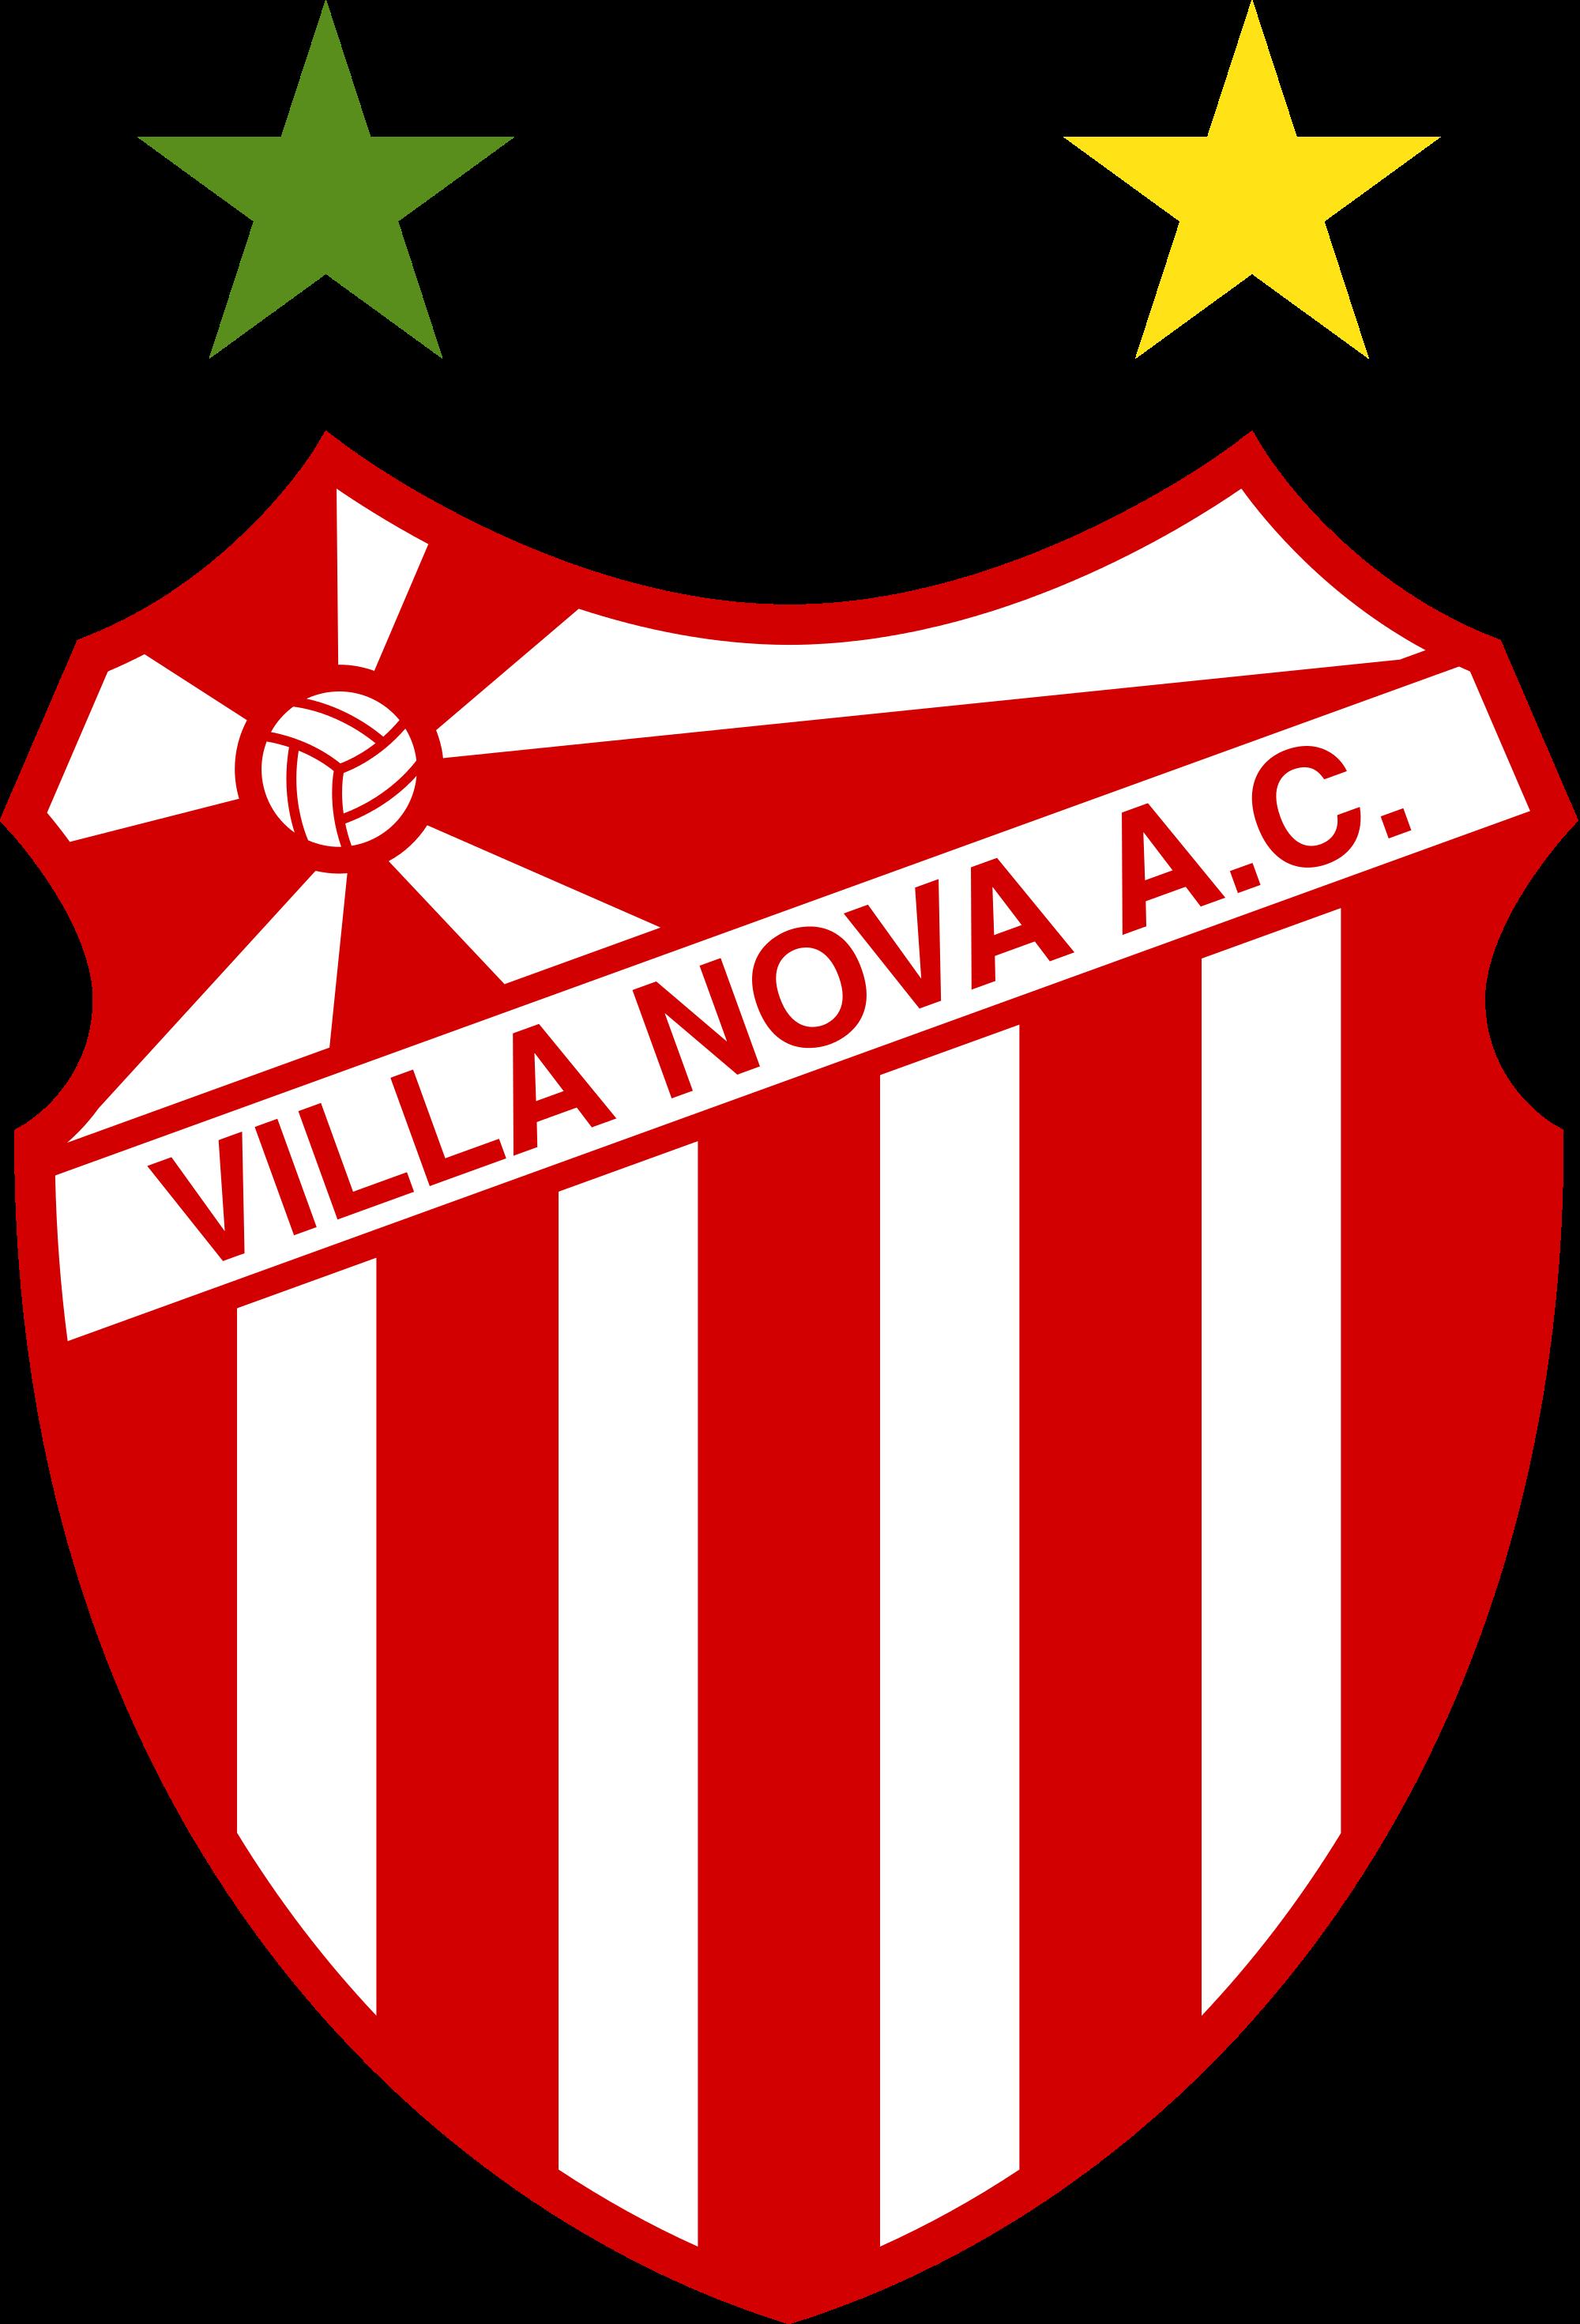 Villa Nova Atlético Clube Minas Gerais